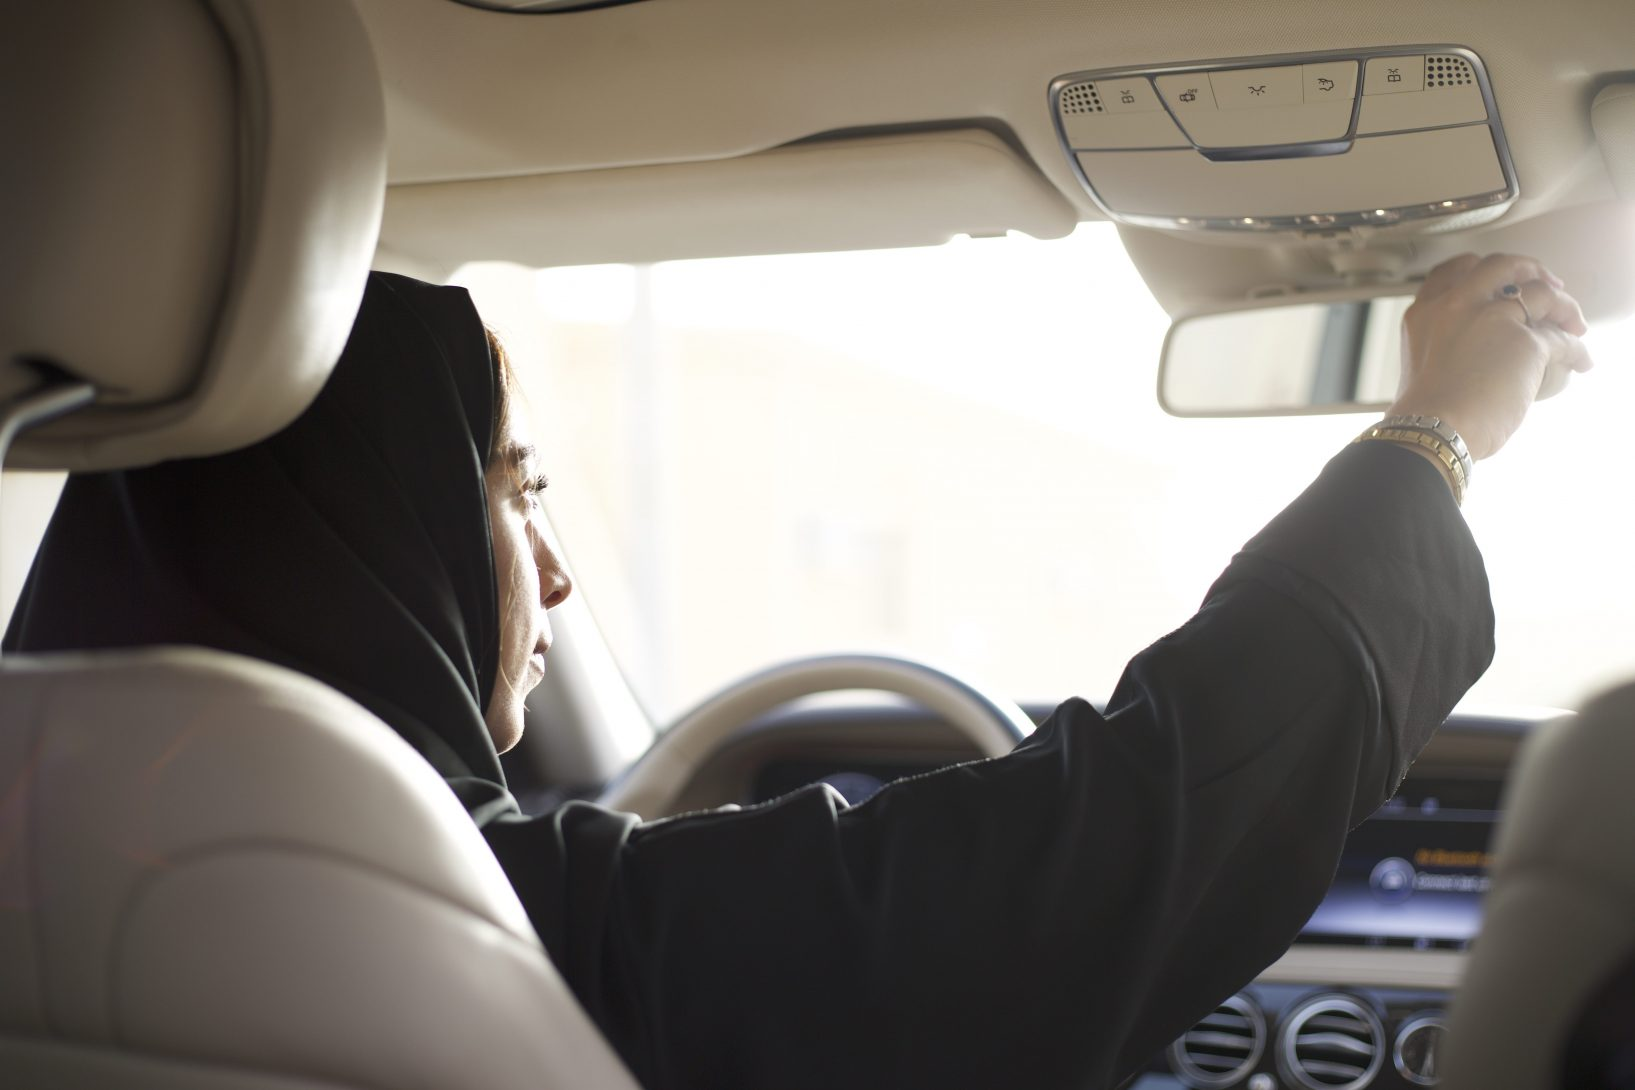 uber to pilot unique feature designed for women drivers in saudi arabia 1635x1090